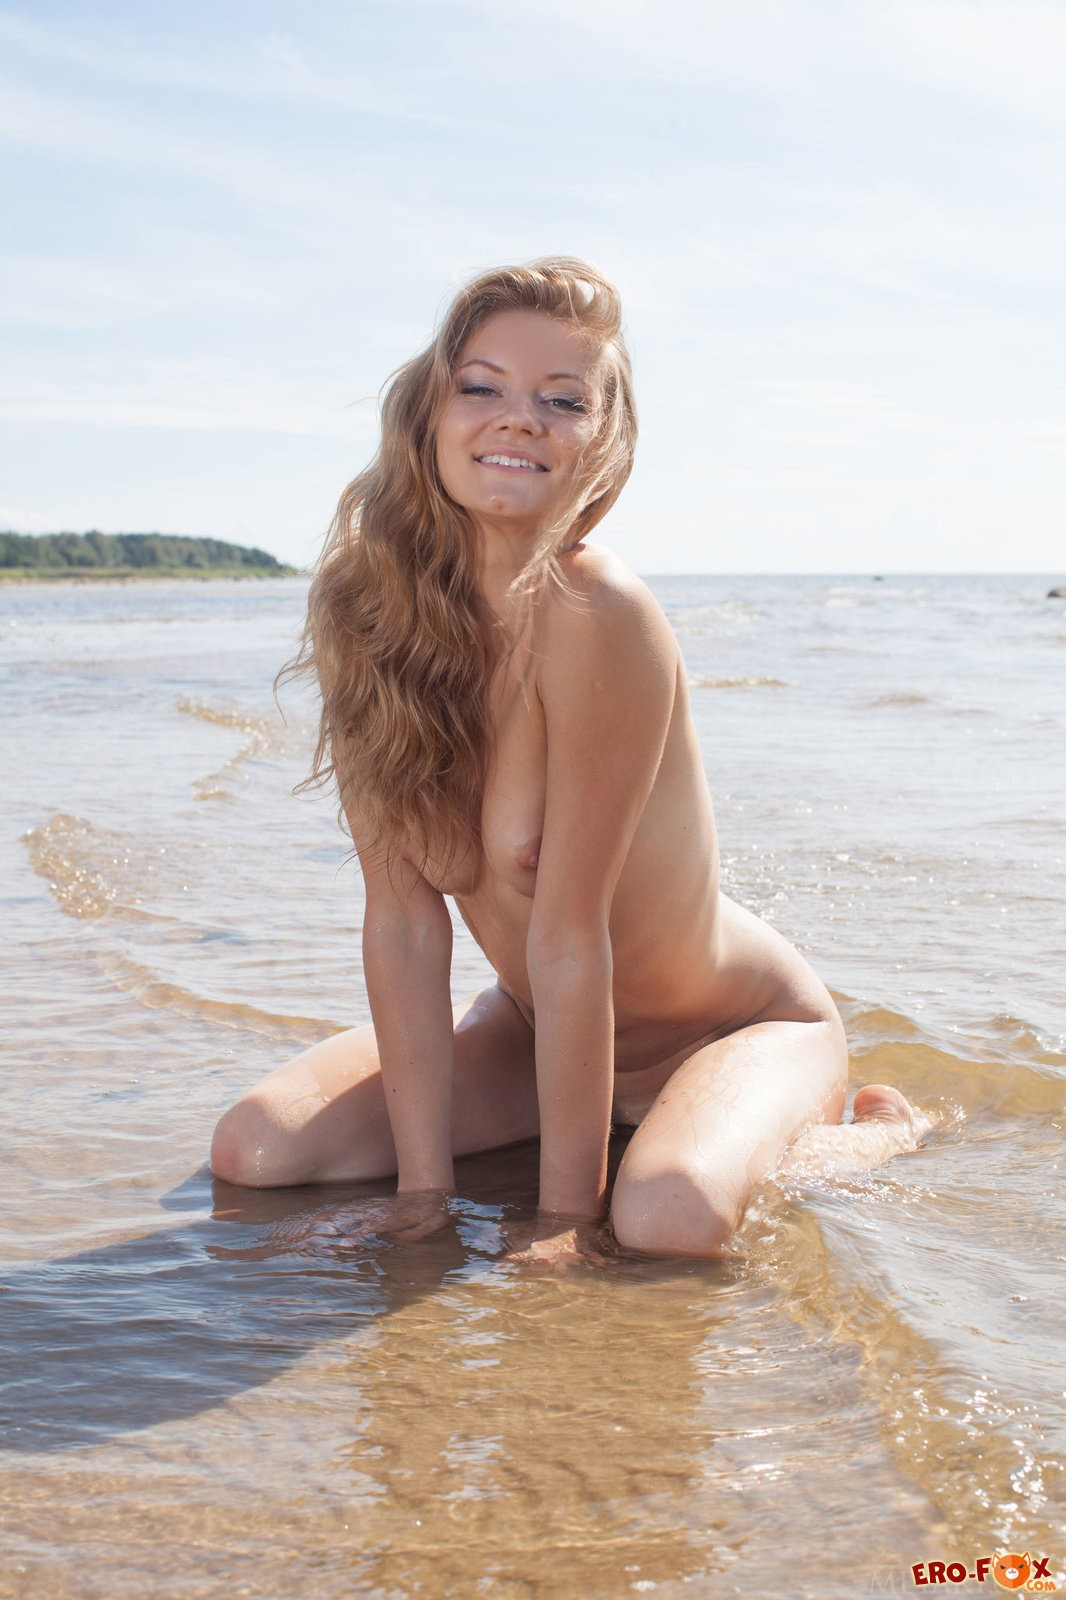 Сексуальная голая красотка купается на пляже